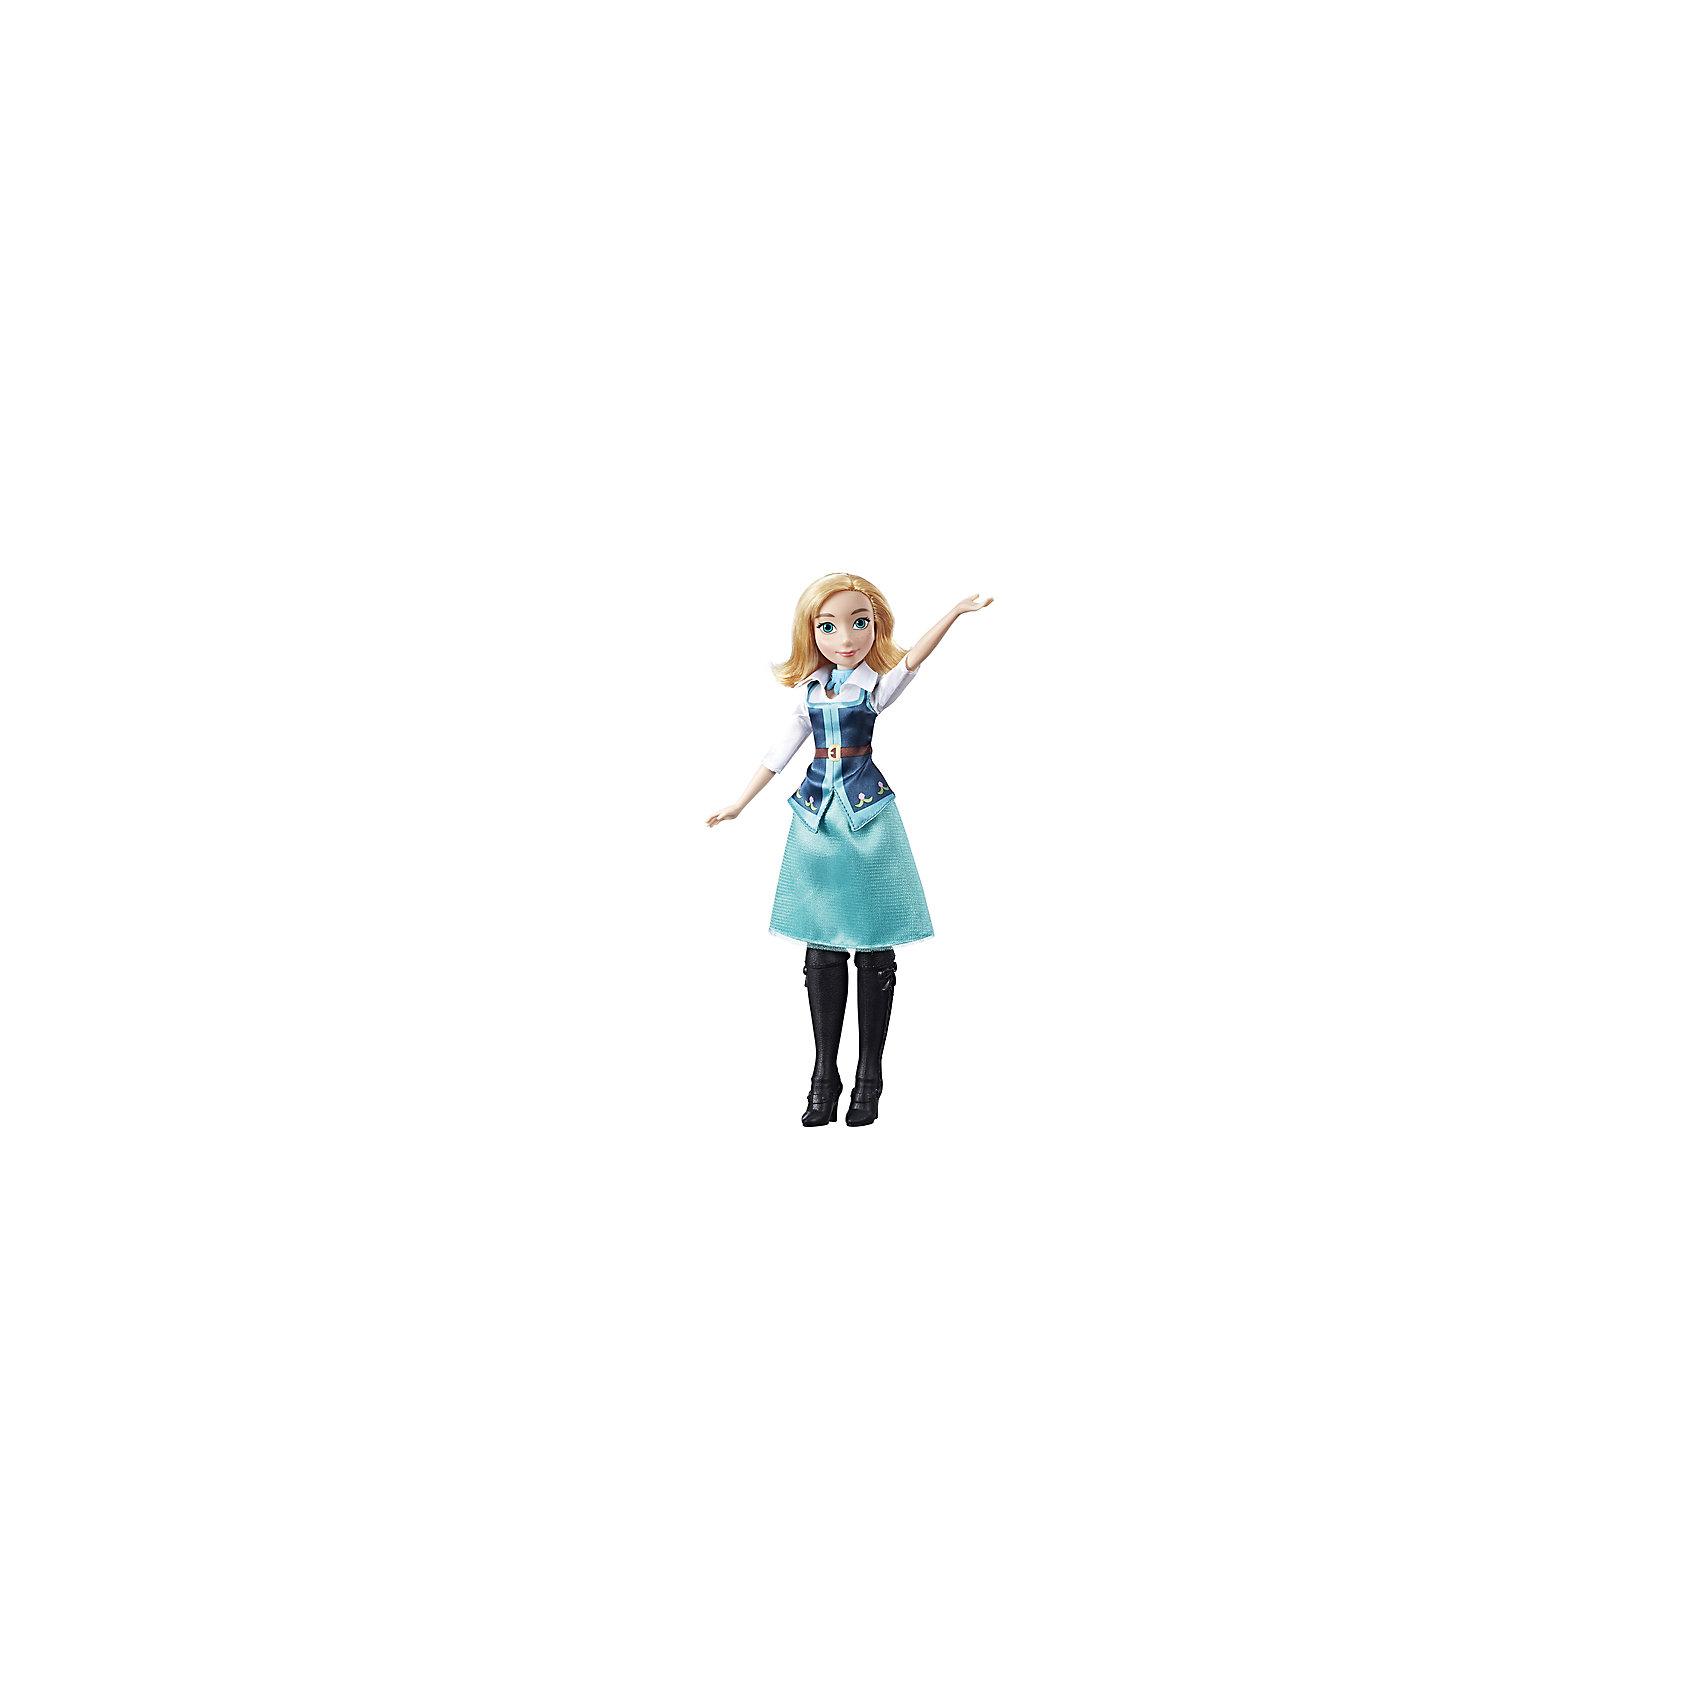 Кукла Hasbro Елена - принцесса Авалона, НаомиКуклы-модели<br><br><br>Ширина мм: 9999<br>Глубина мм: 9999<br>Высота мм: 9999<br>Вес г: 9999<br>Возраст от месяцев: 36<br>Возраст до месяцев: 120<br>Пол: Женский<br>Возраст: Детский<br>SKU: 7097974